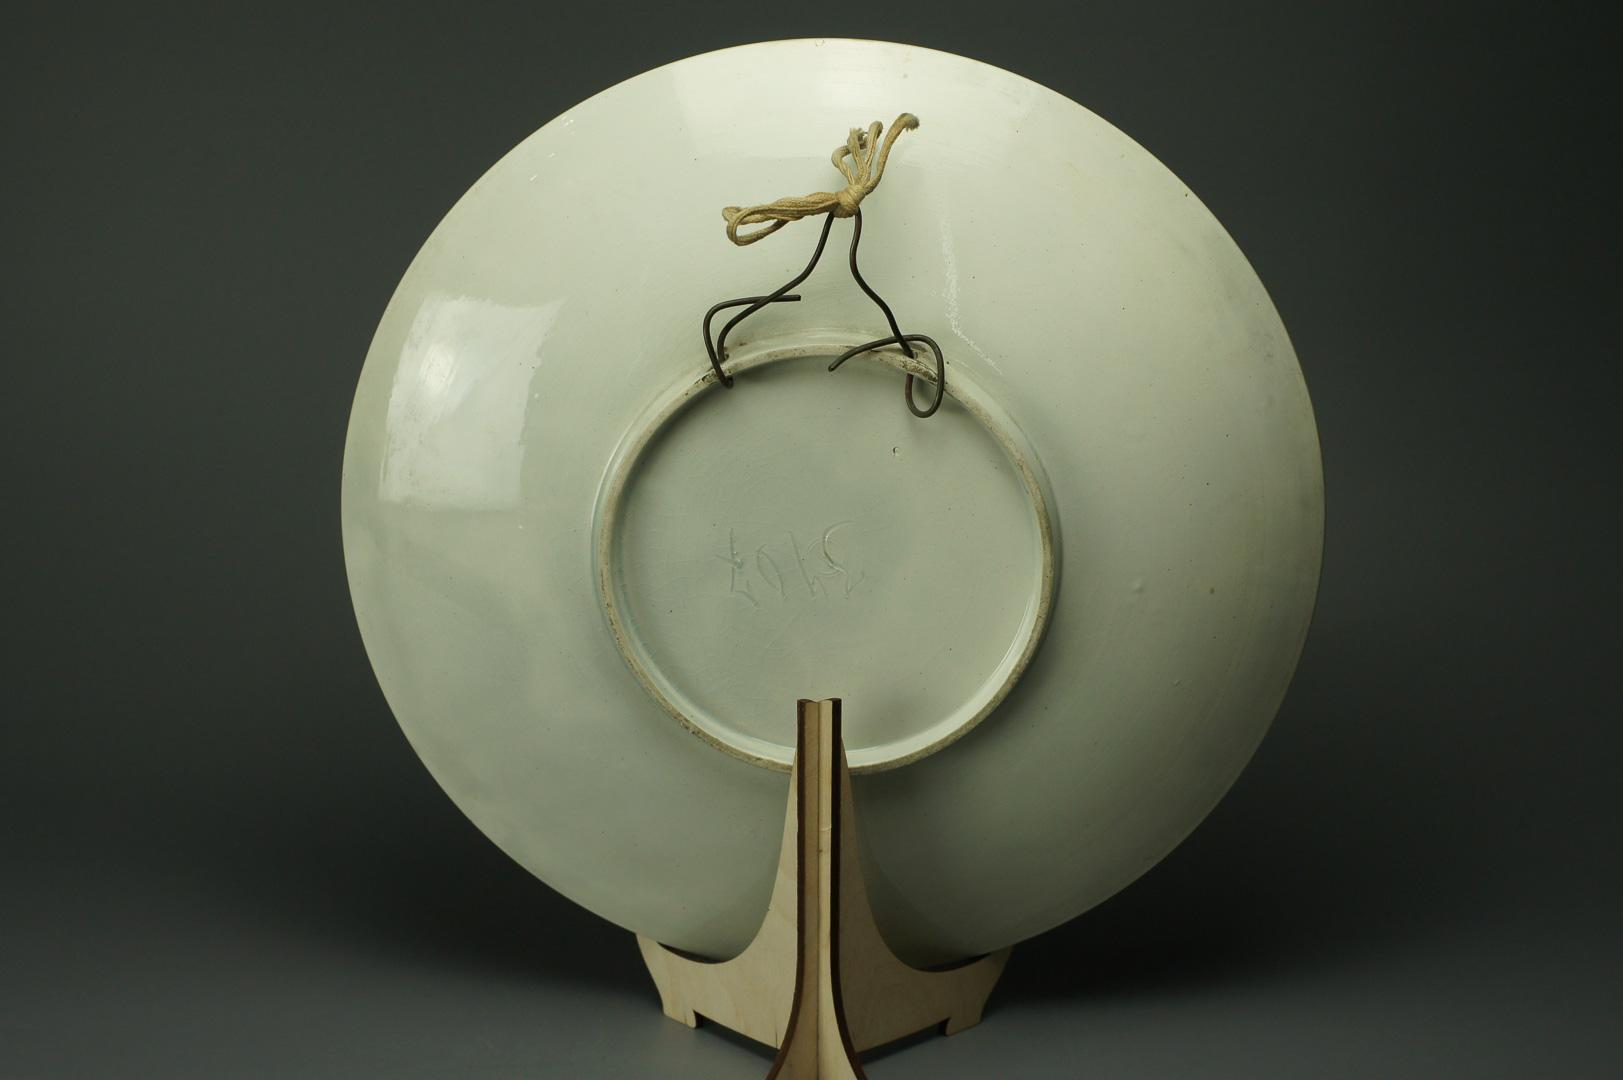 Тарелка настенная Пастушка Конаково